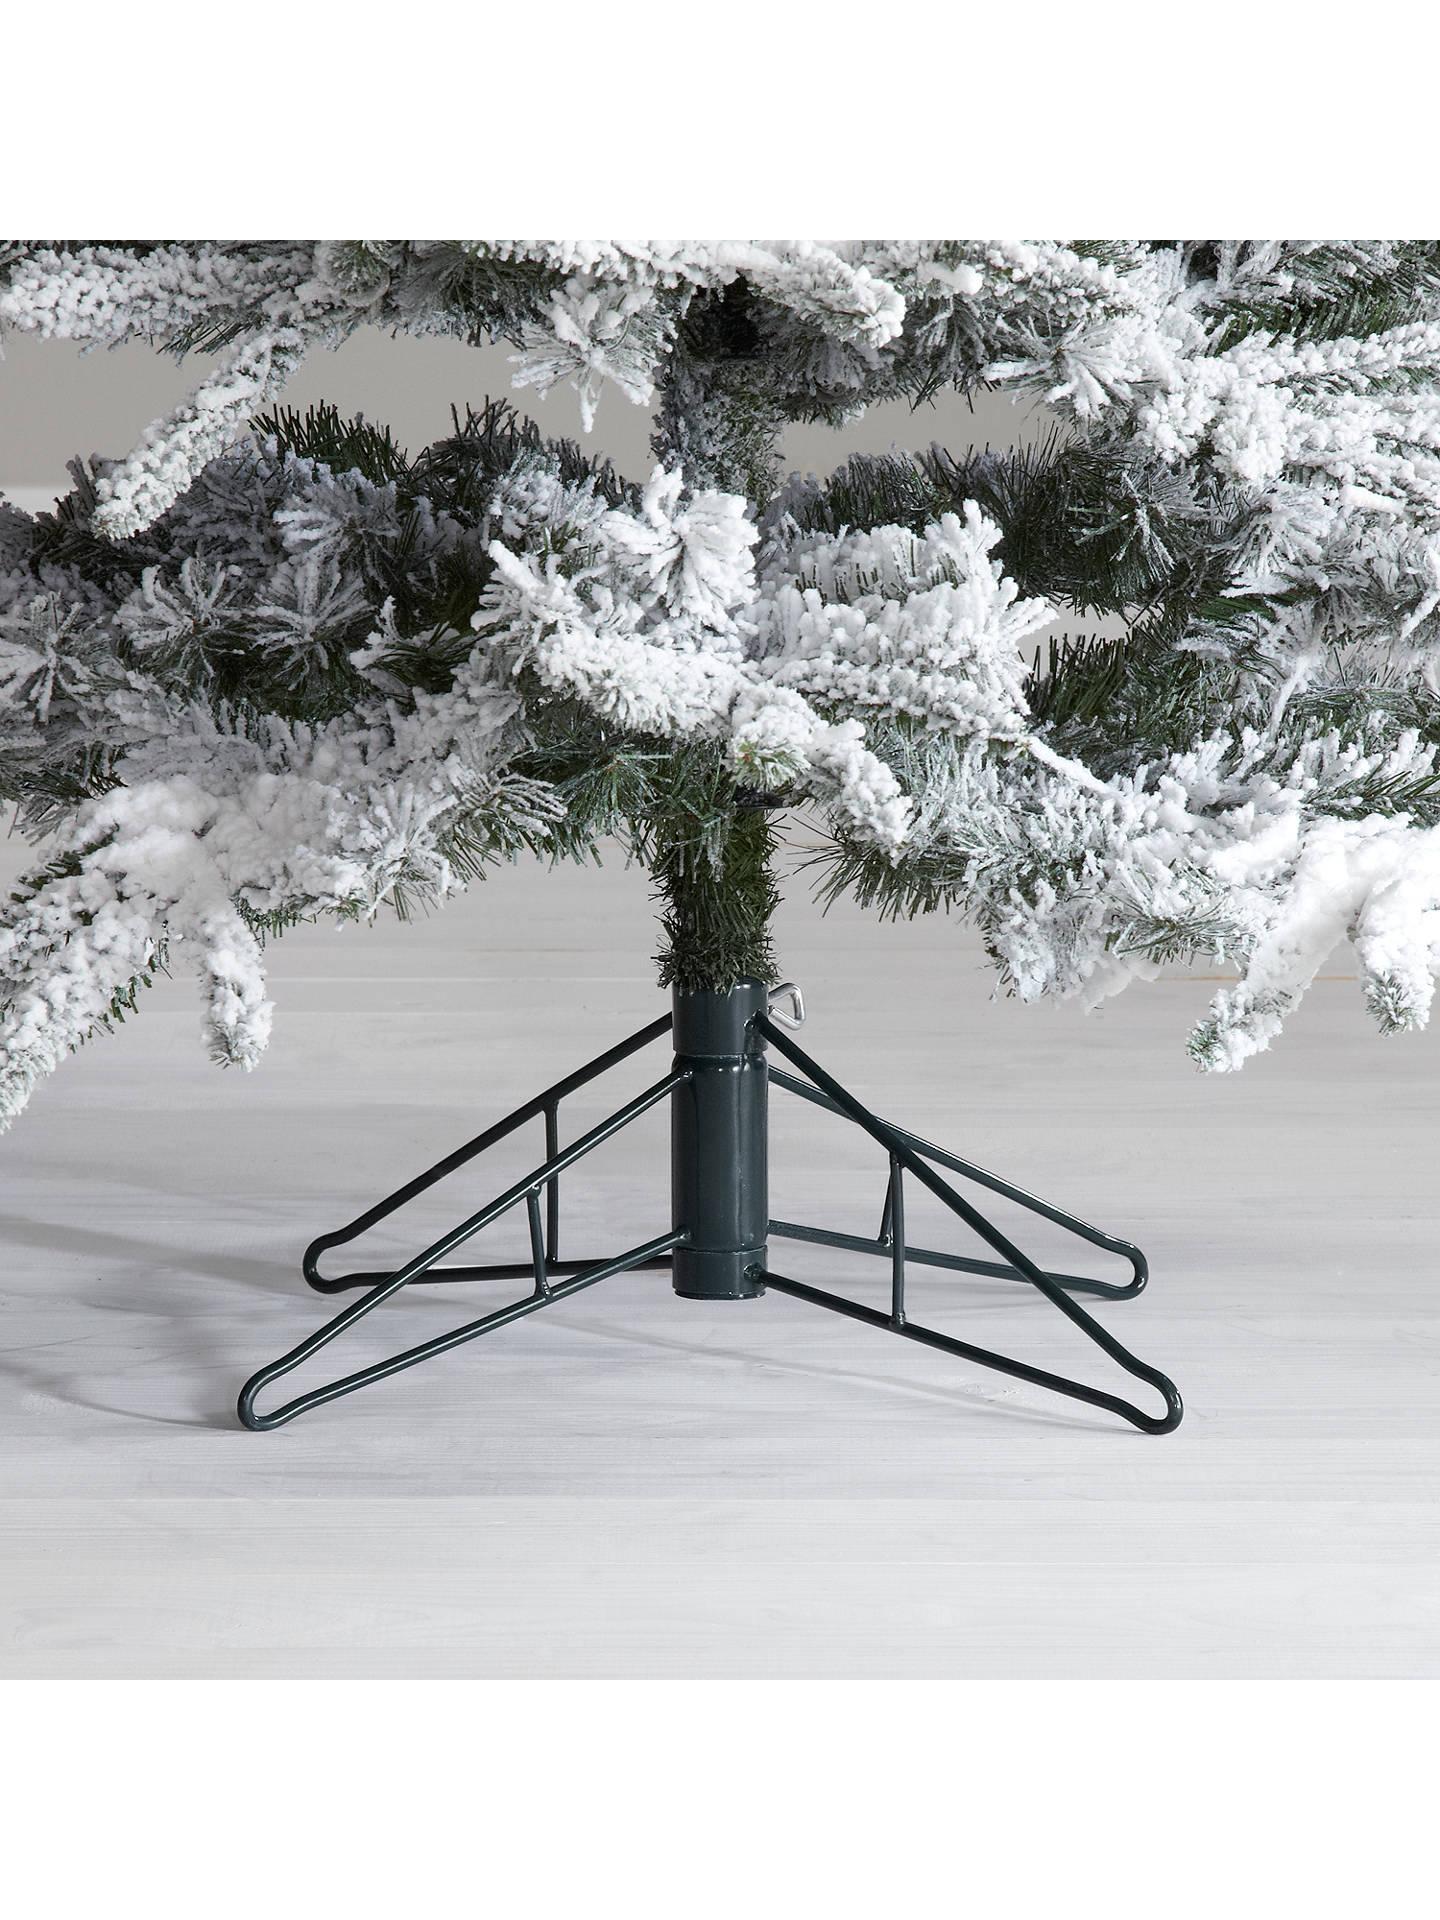 John Lewis Pre-Lit Snowy Mountain Pine Christmas Tree, 7ft at John Lewis & Partners